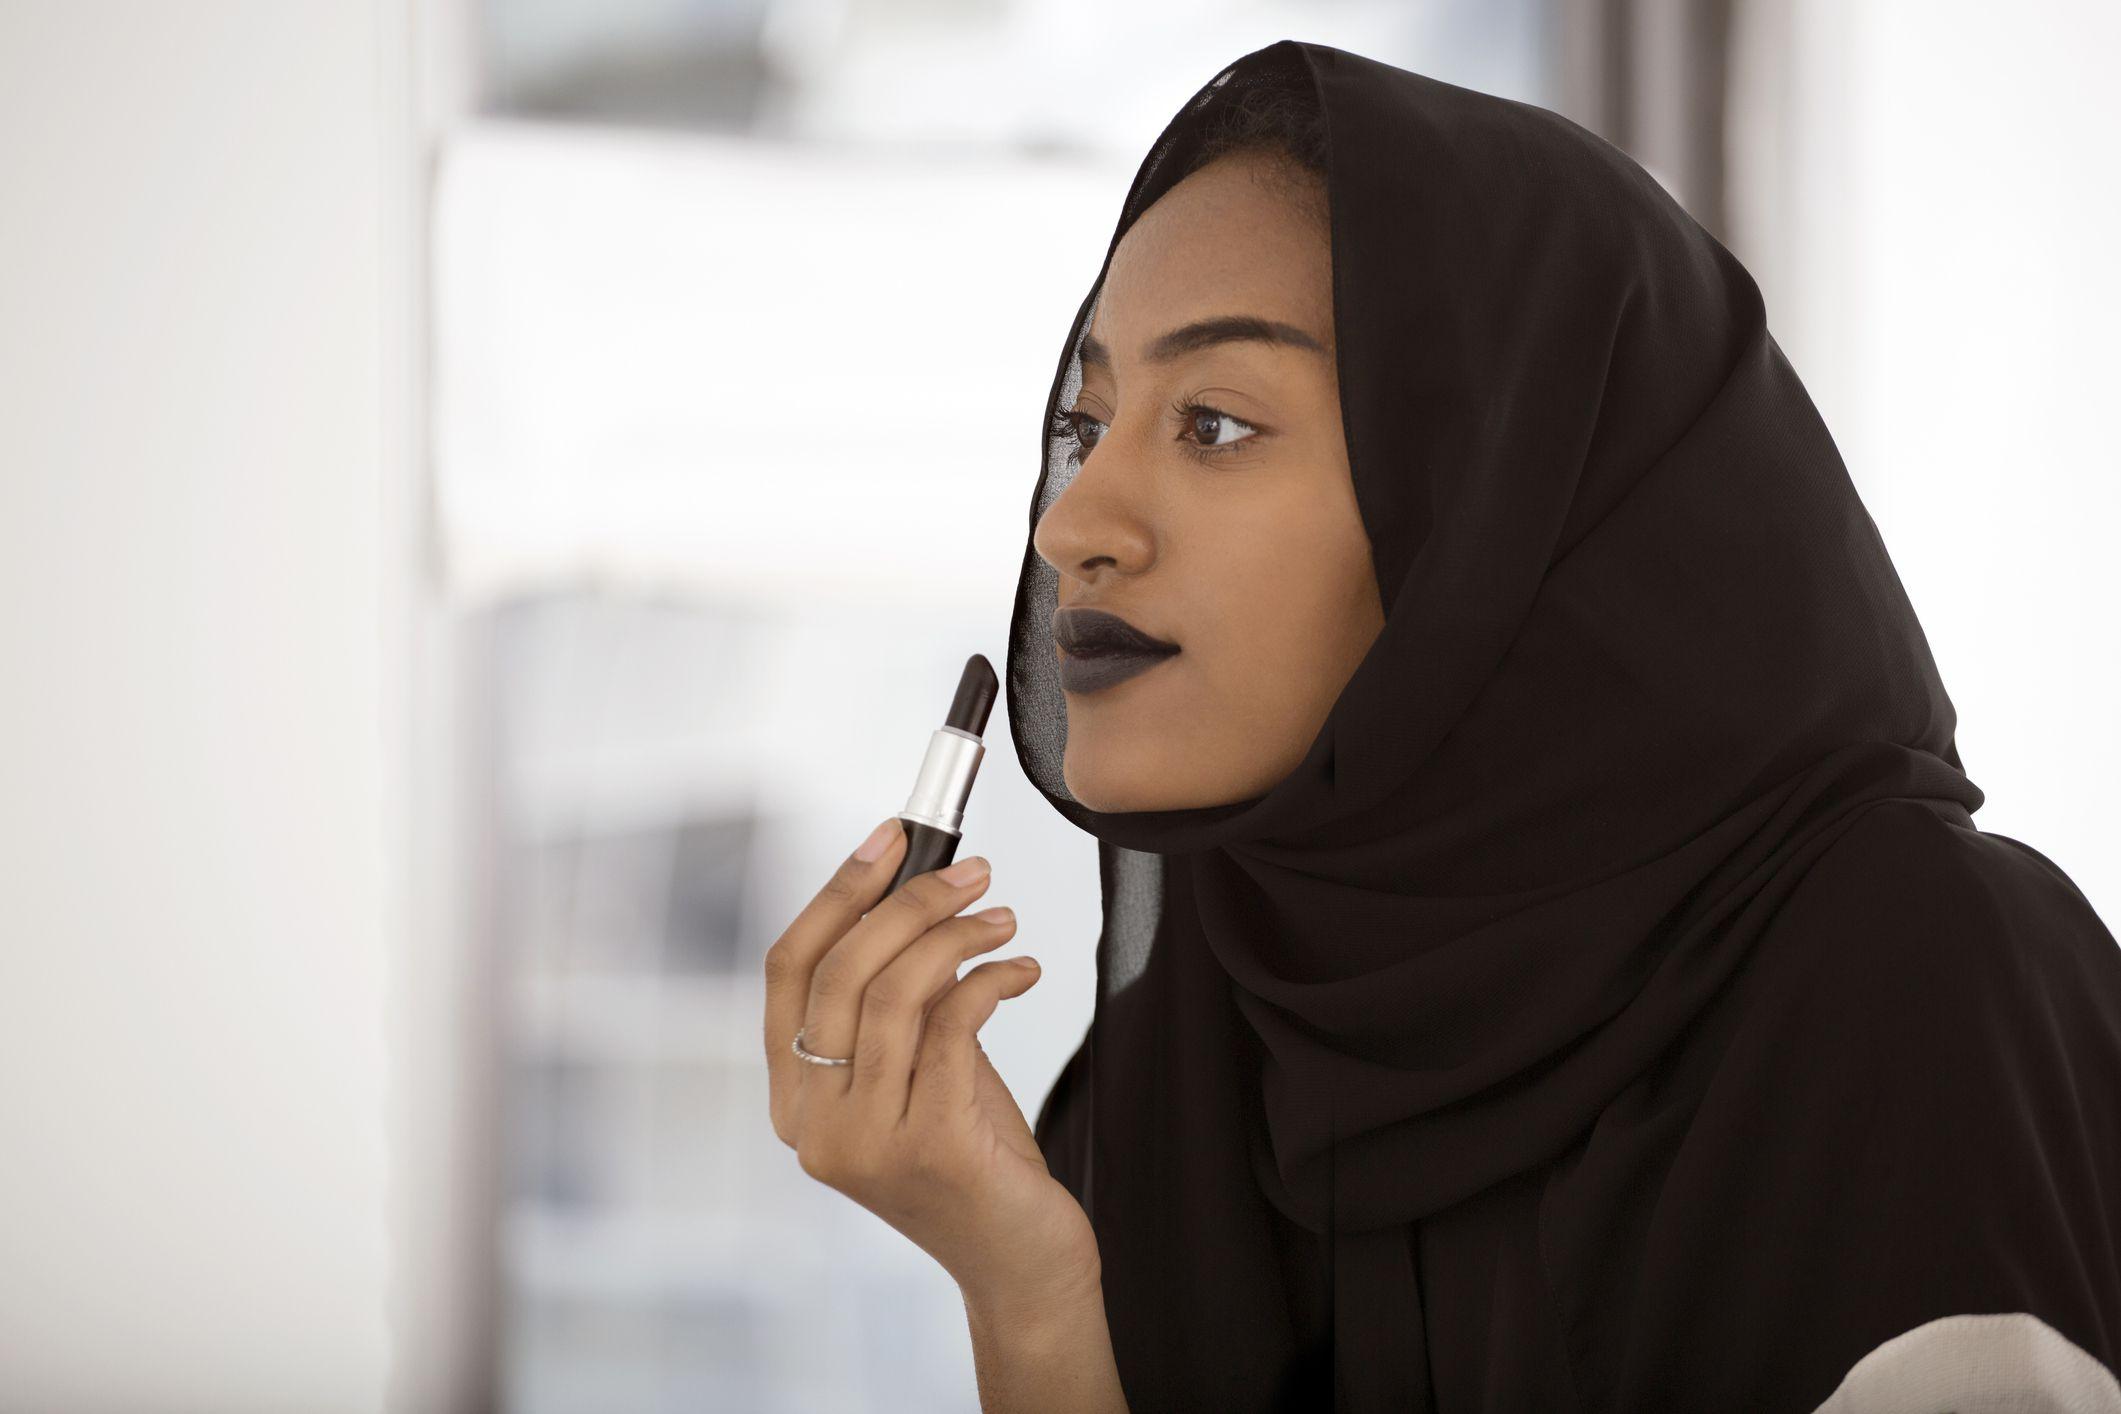 A muslim woman applies dark lipstick in the mirror.